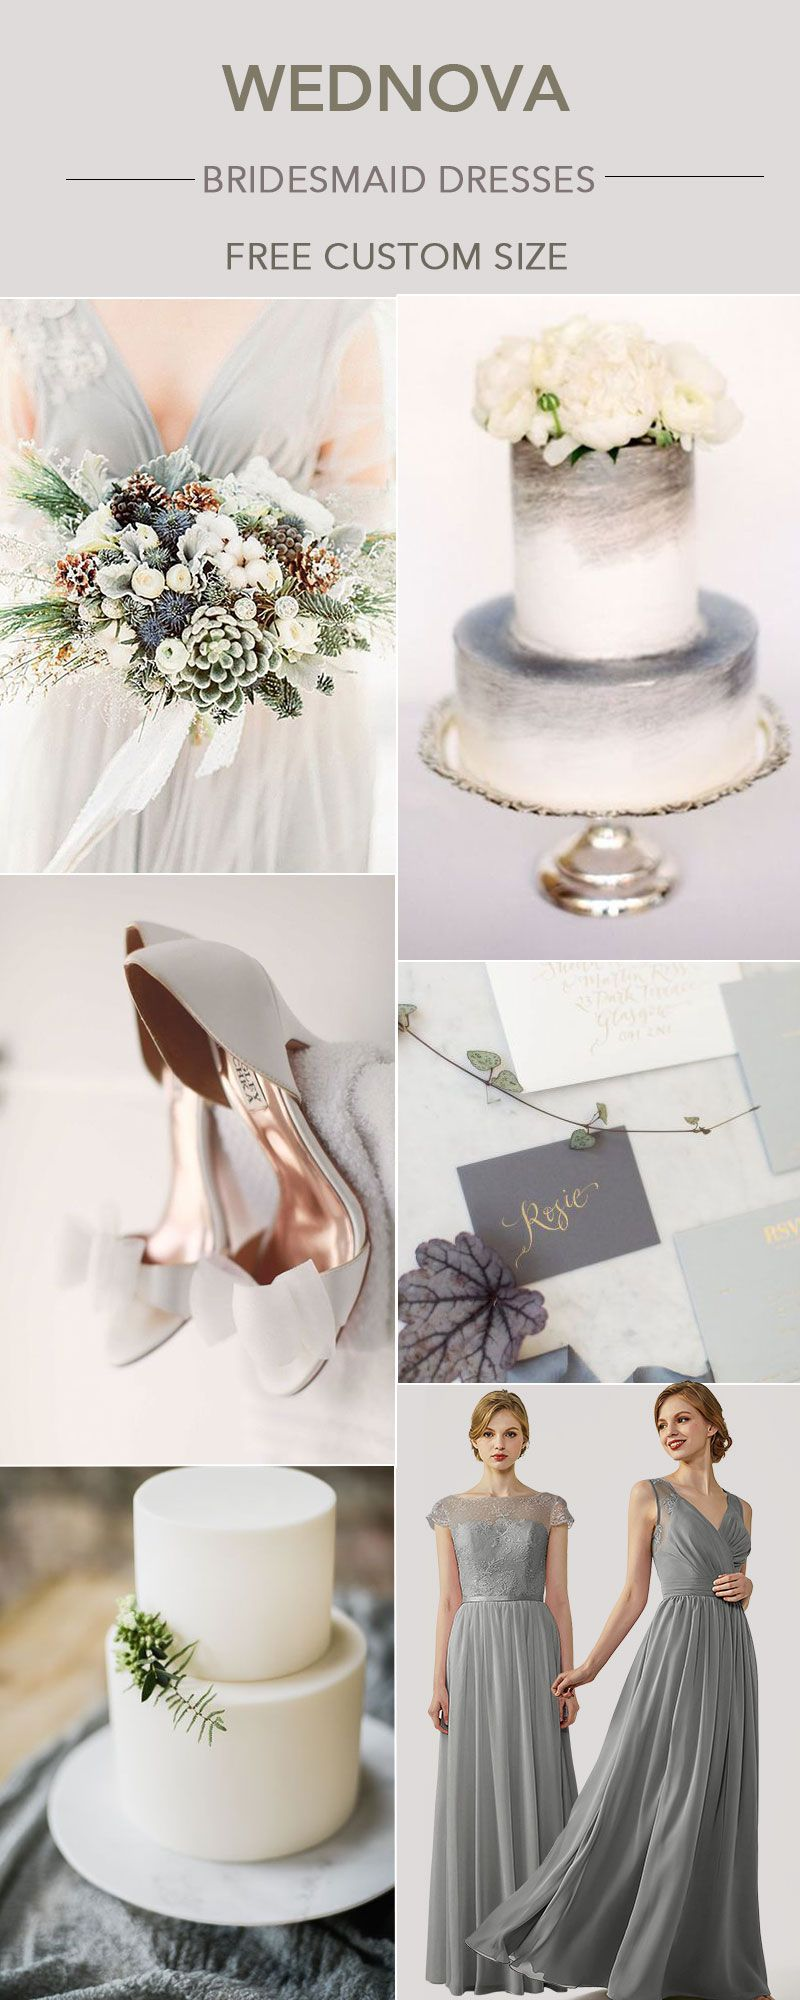 Lace dress gray  Beautiful chiffon bridesmaid dress gray cap sleeves dress with lace